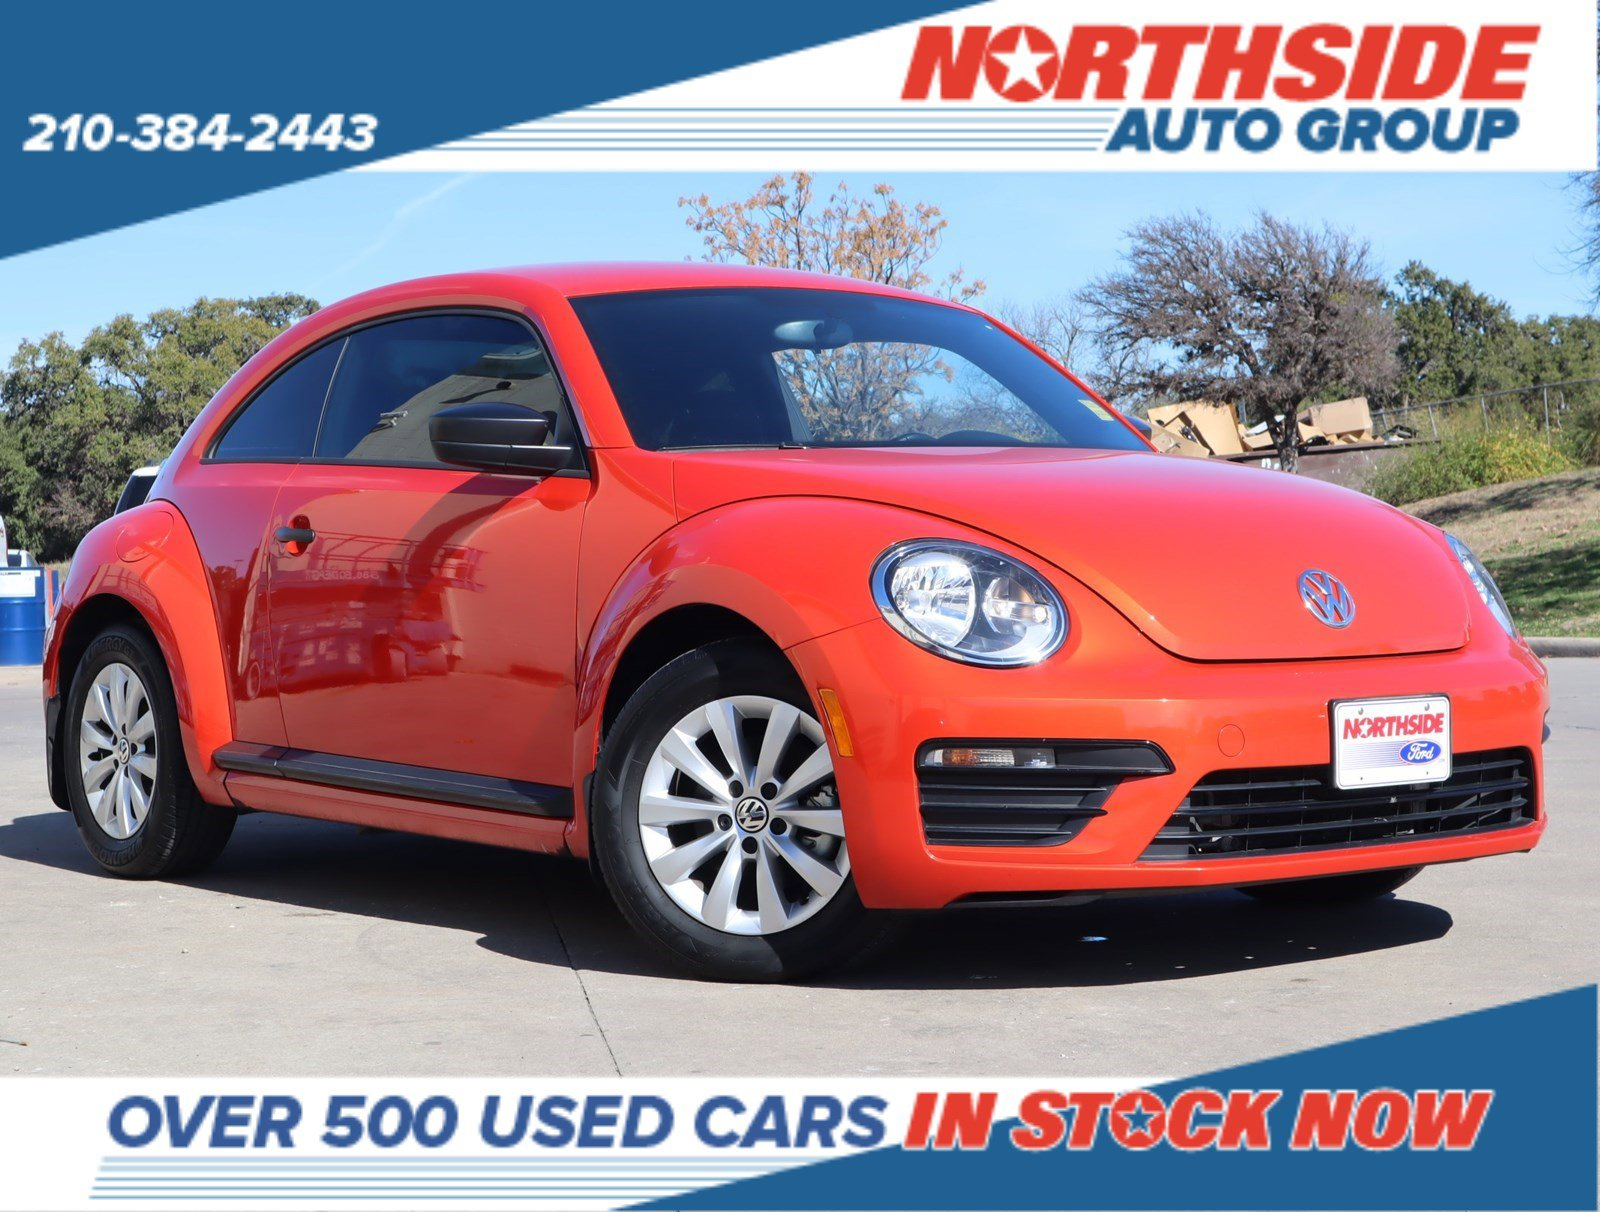 2018 Volkswagen Beetle 2.0T Coupe image